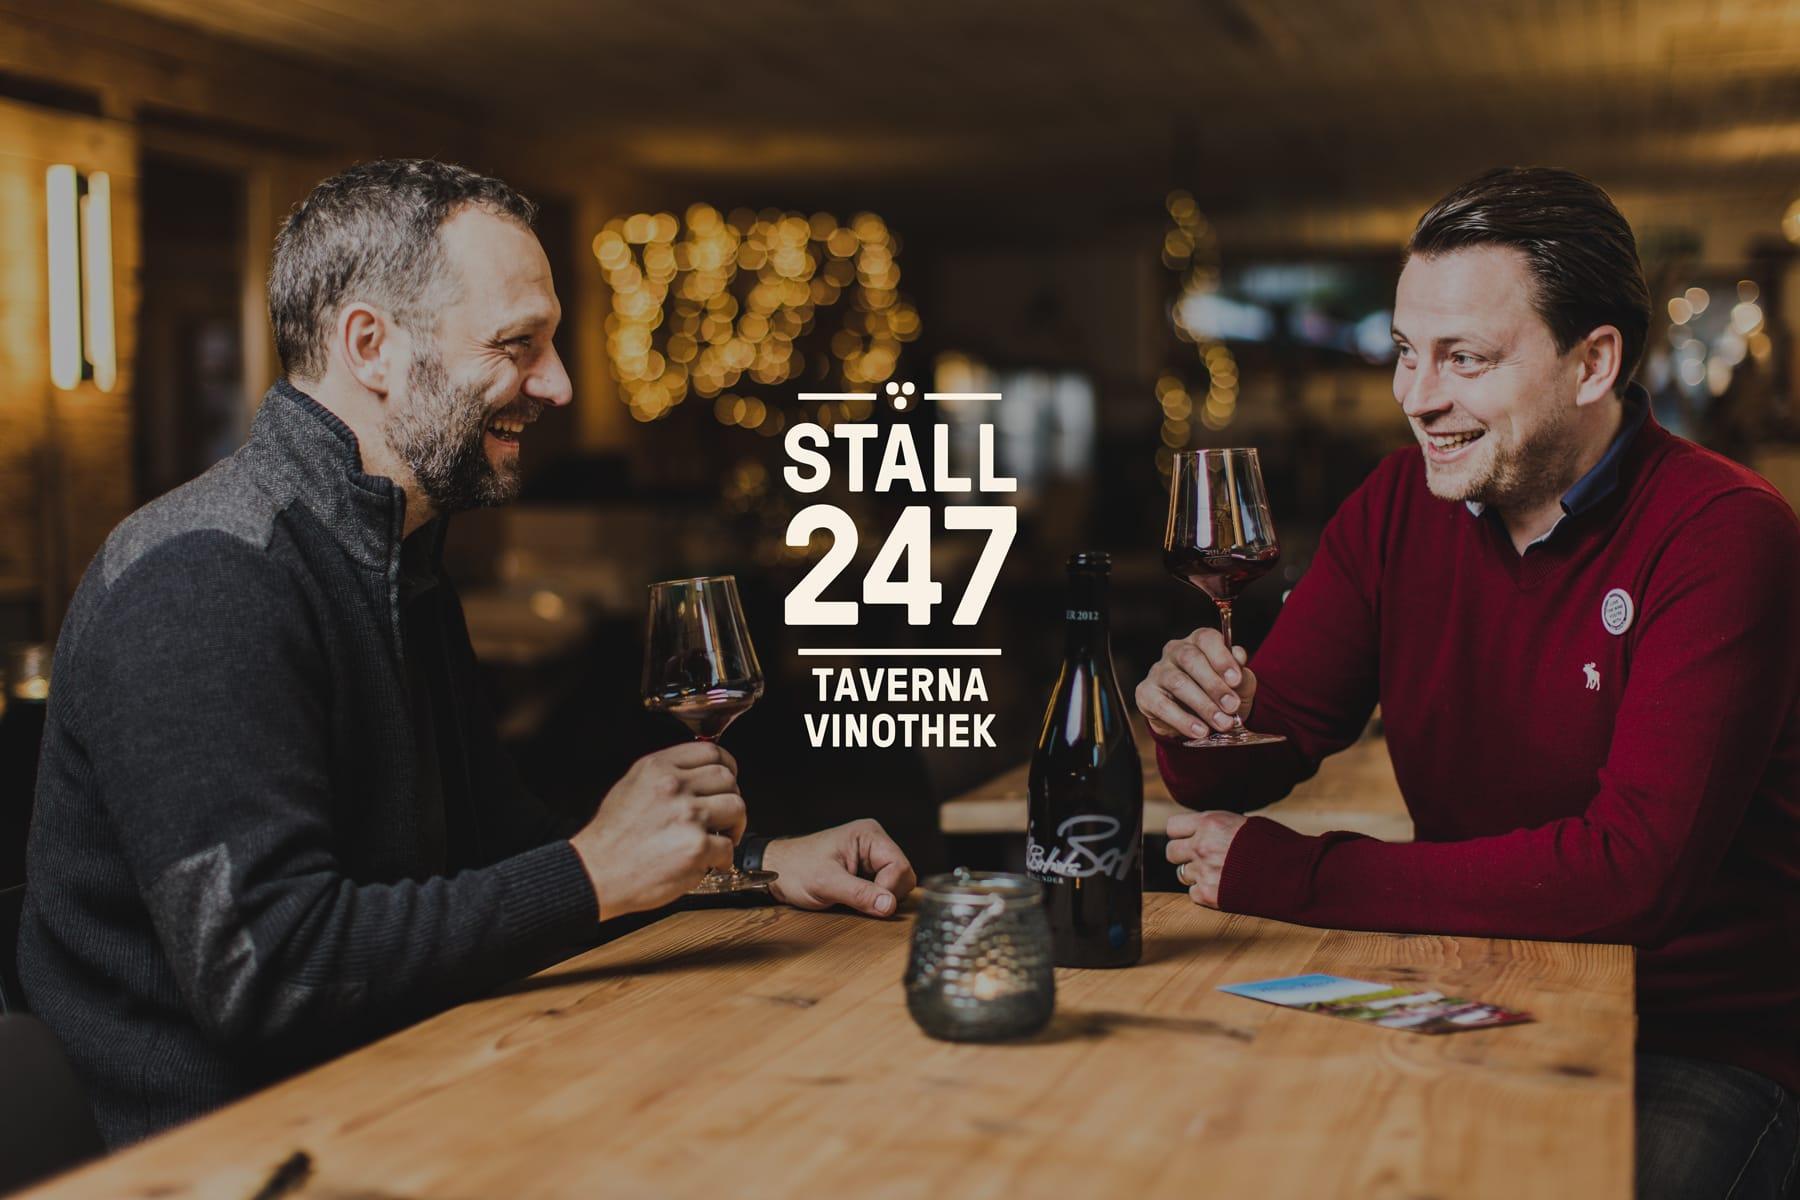 Stall 247 – Maienfeld